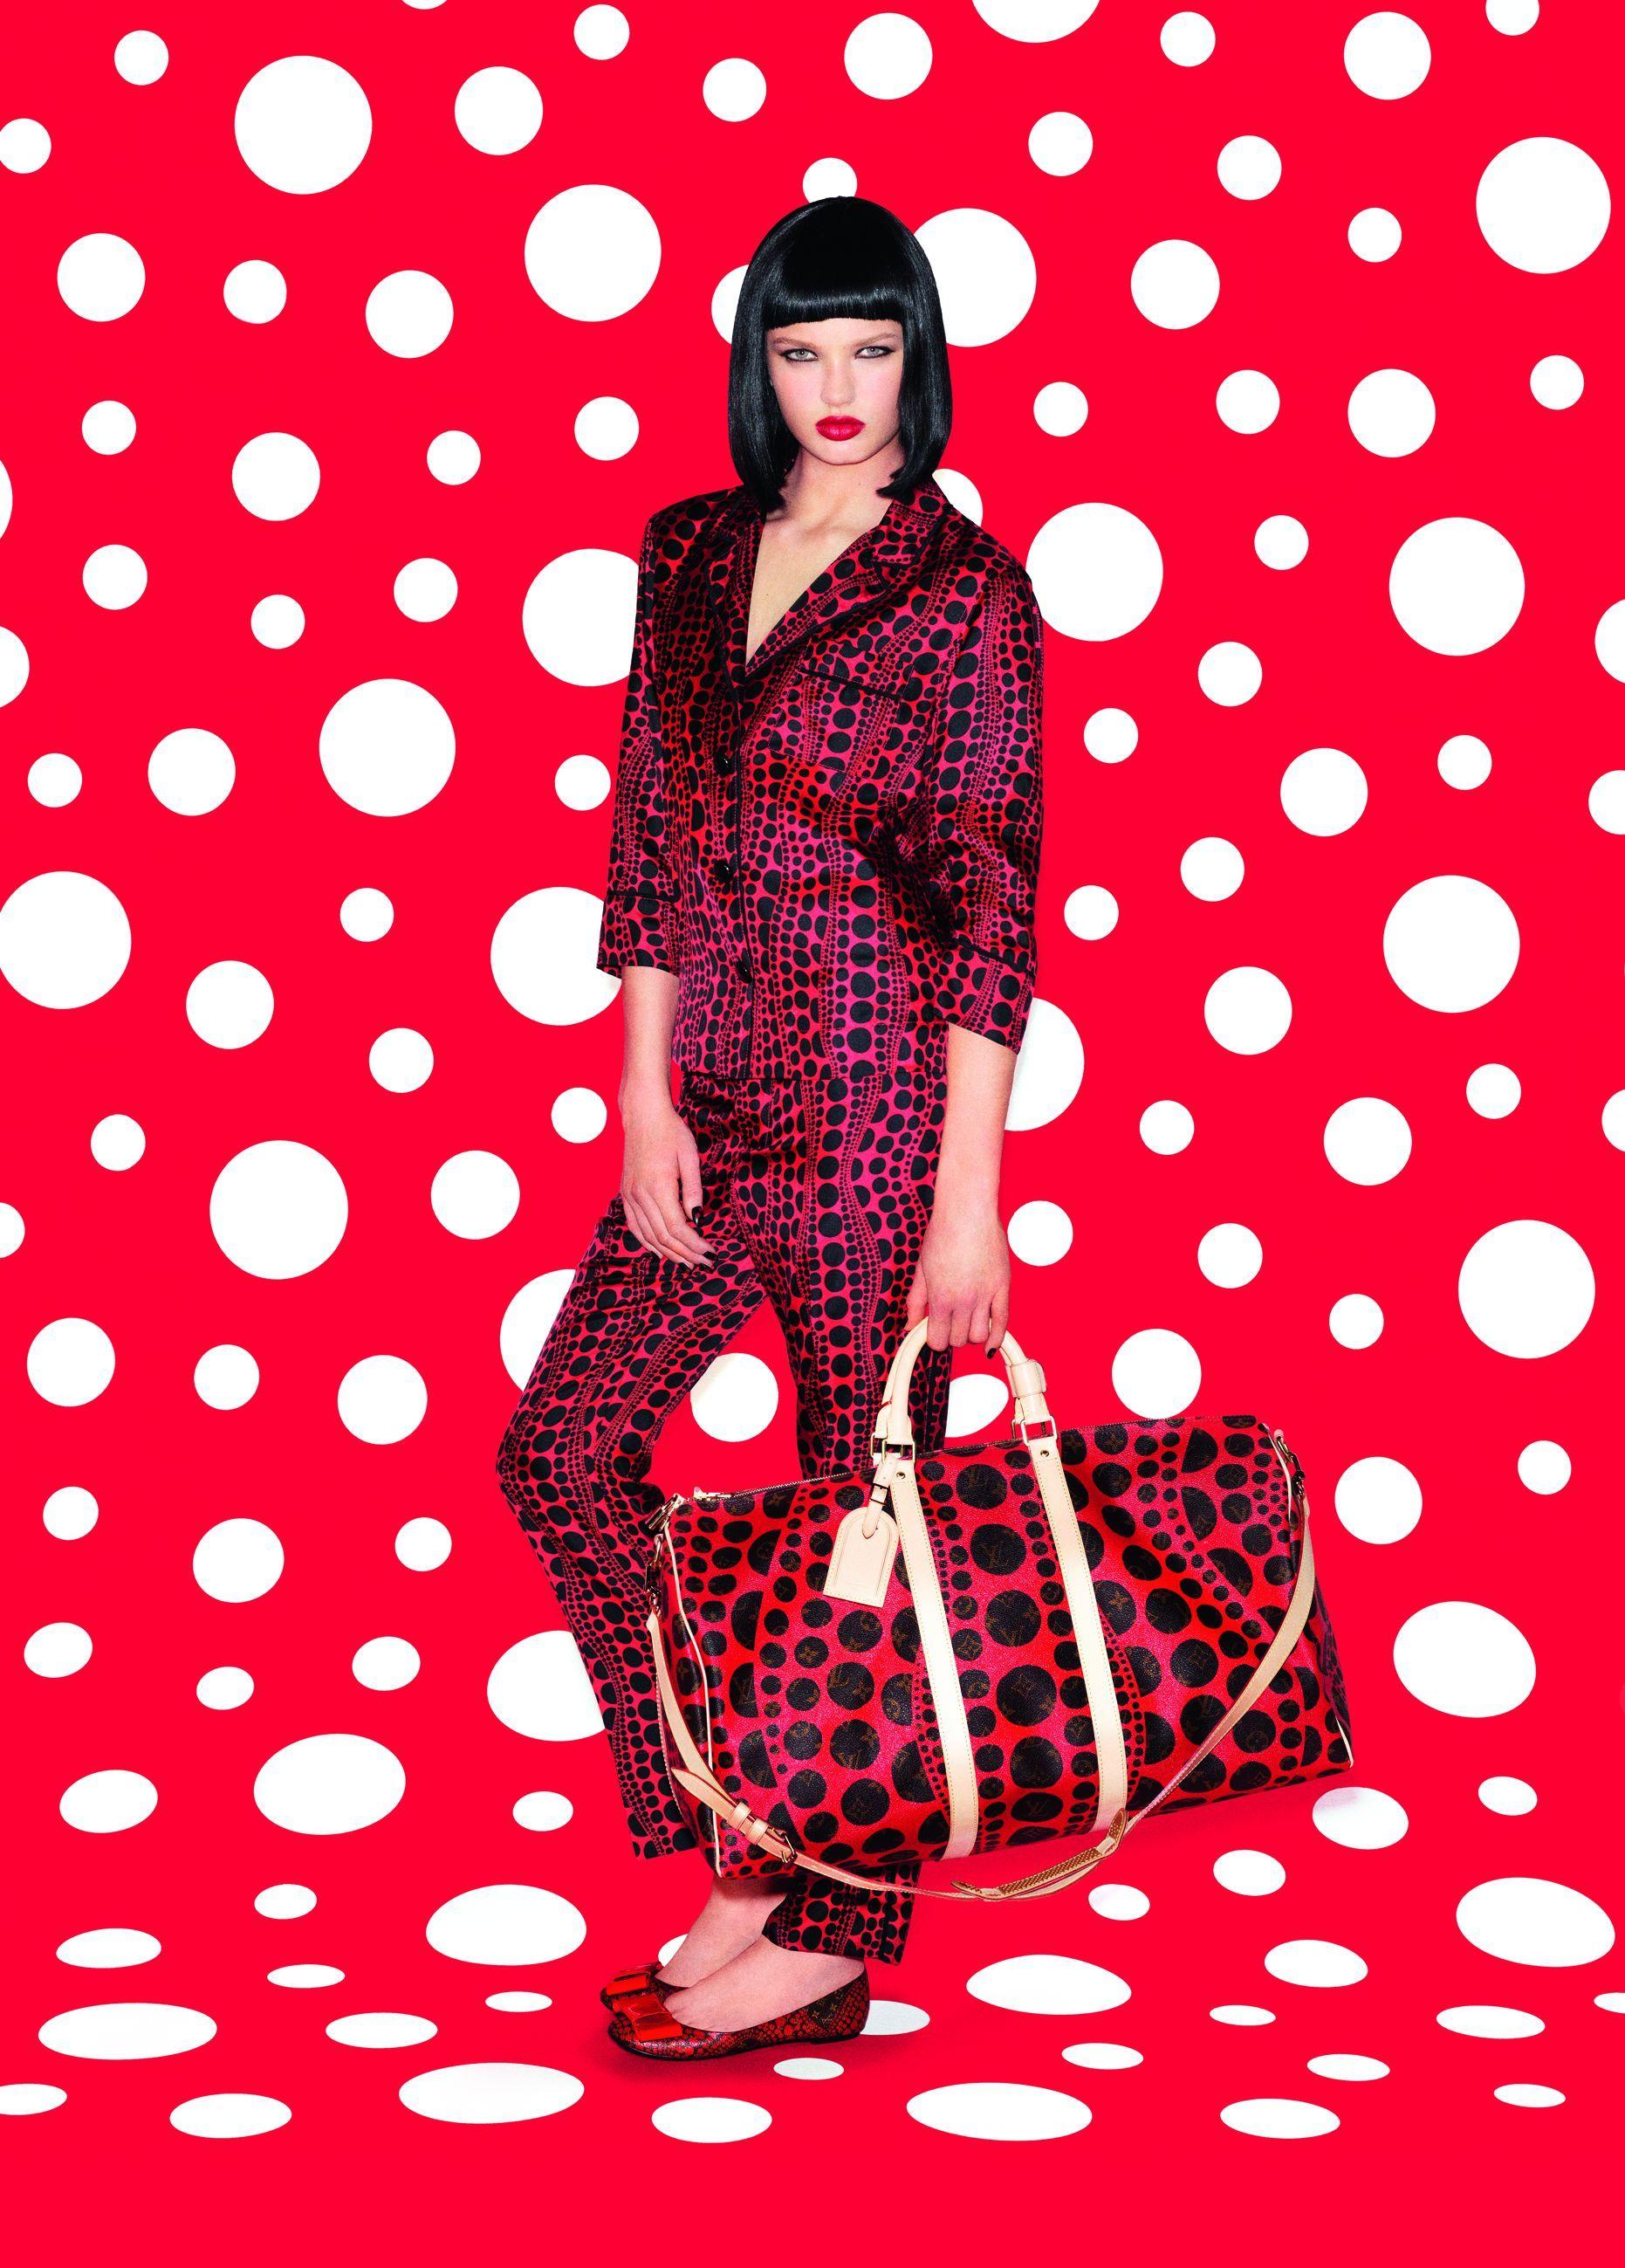 Yayoi Kusama x Louis Vuitton Collection © LOUIS VUITTON